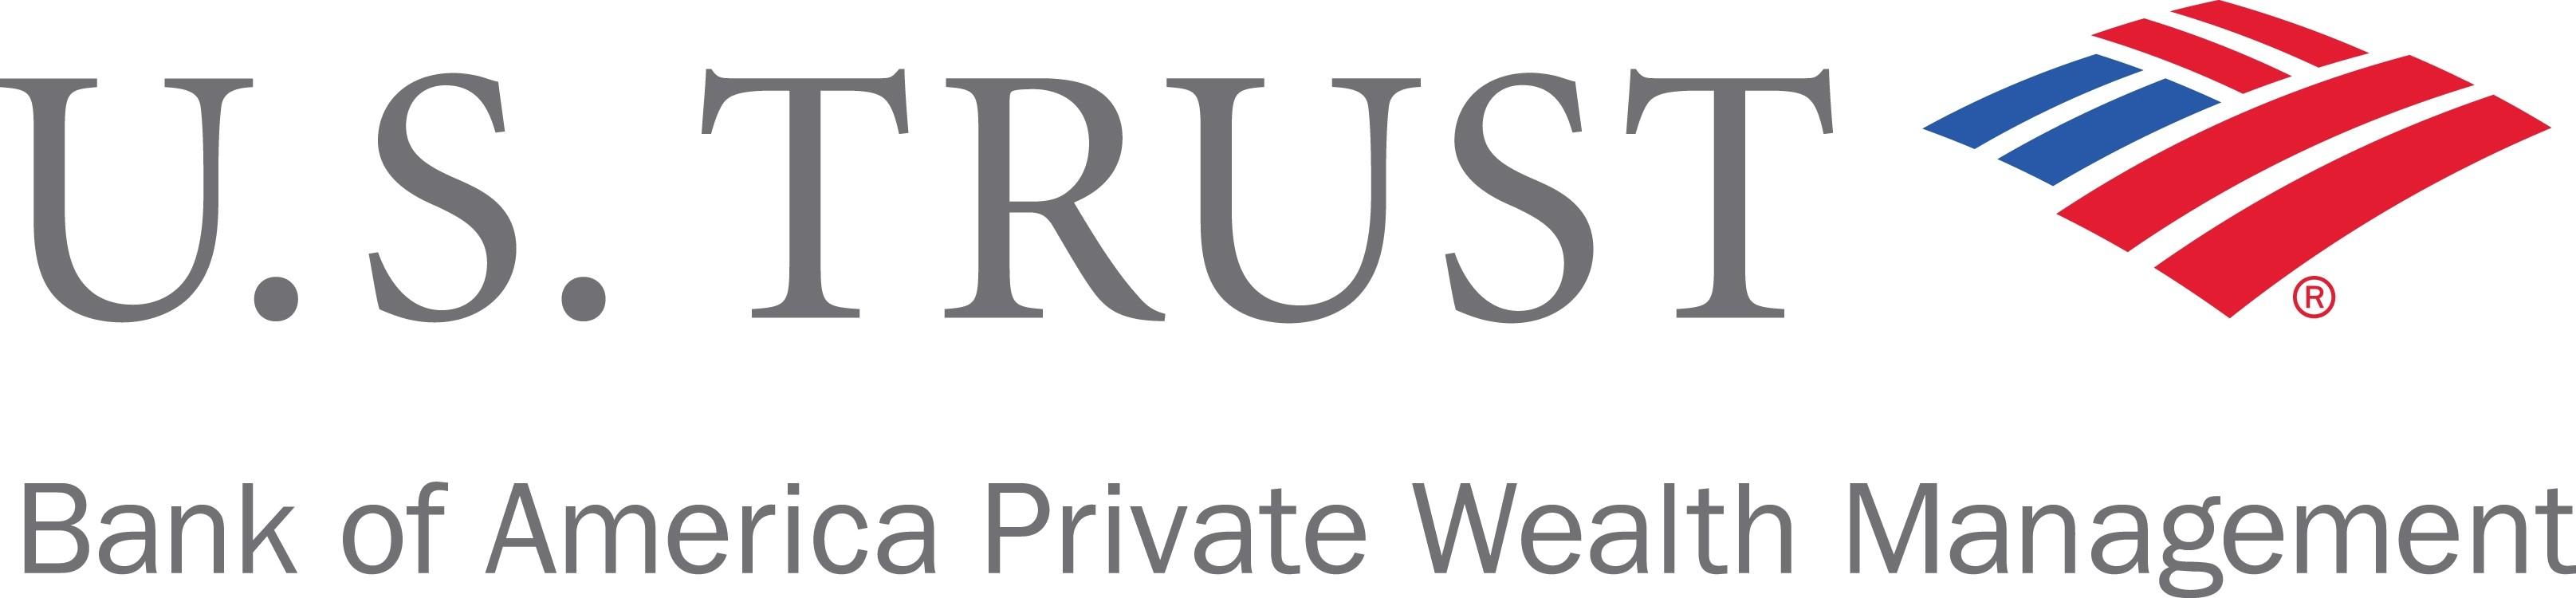 US-trust-logo.jpeg